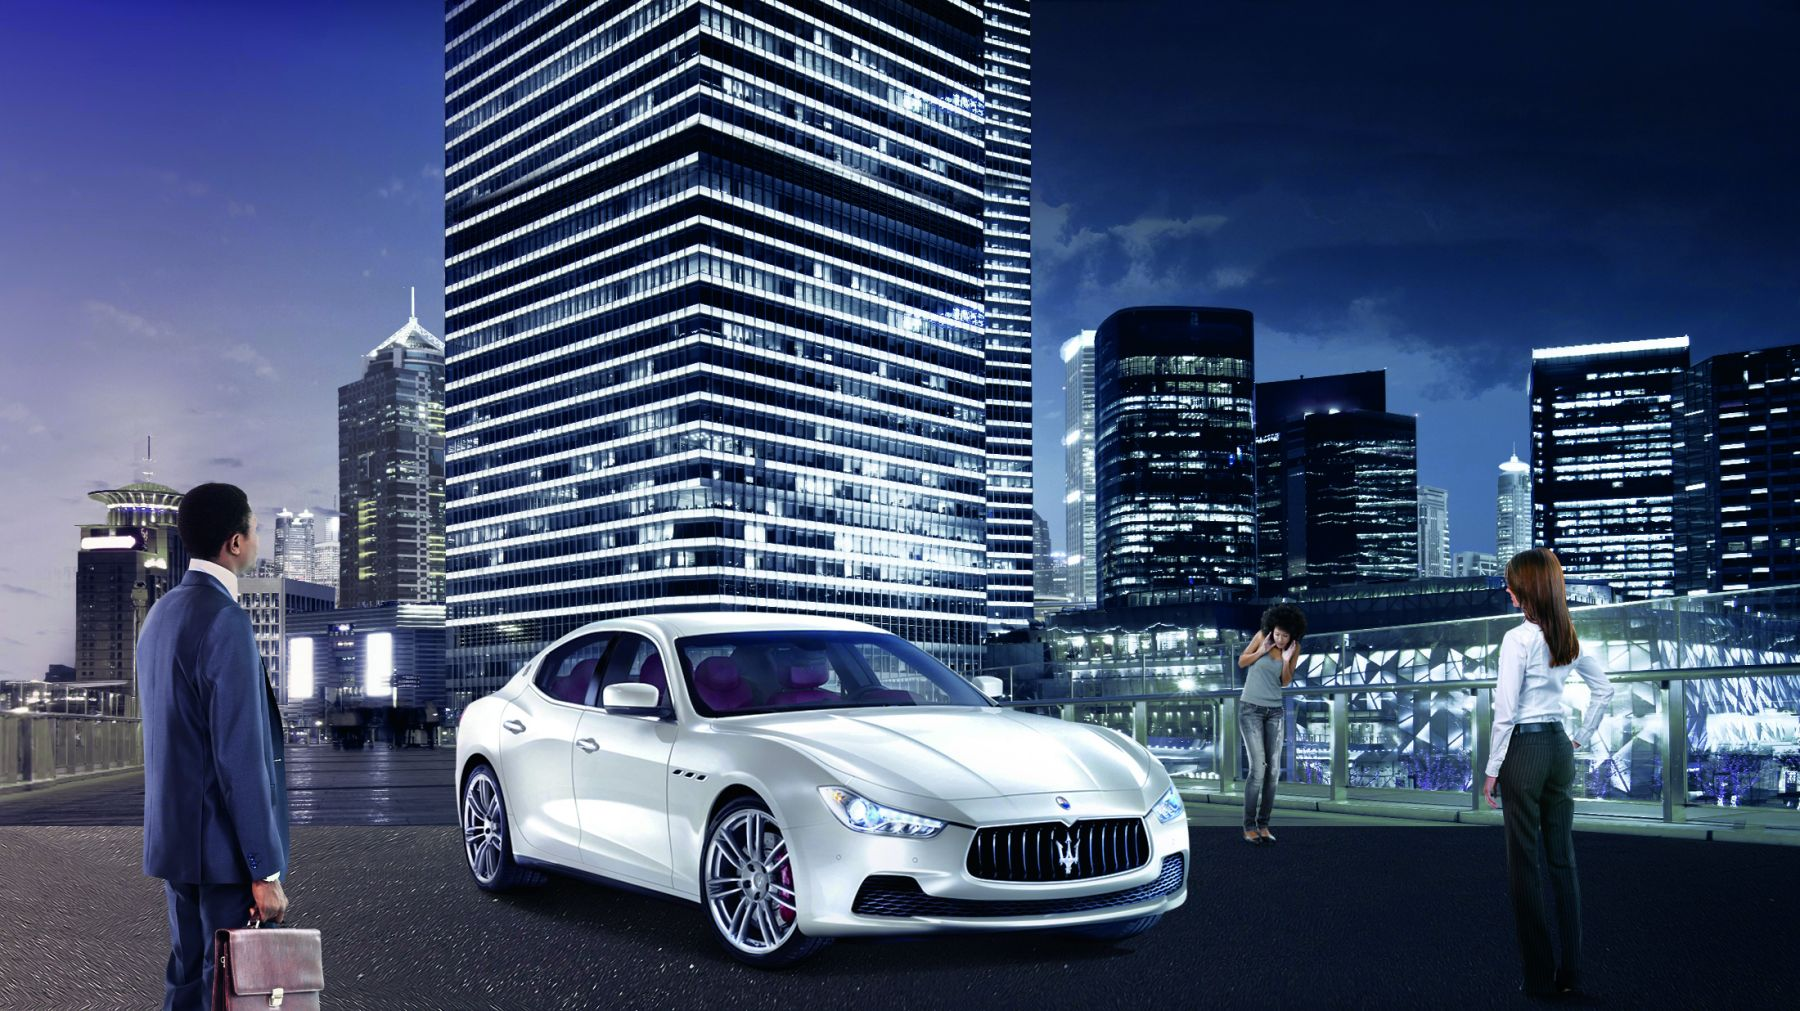 2010-2020 - Maserati Ghibli